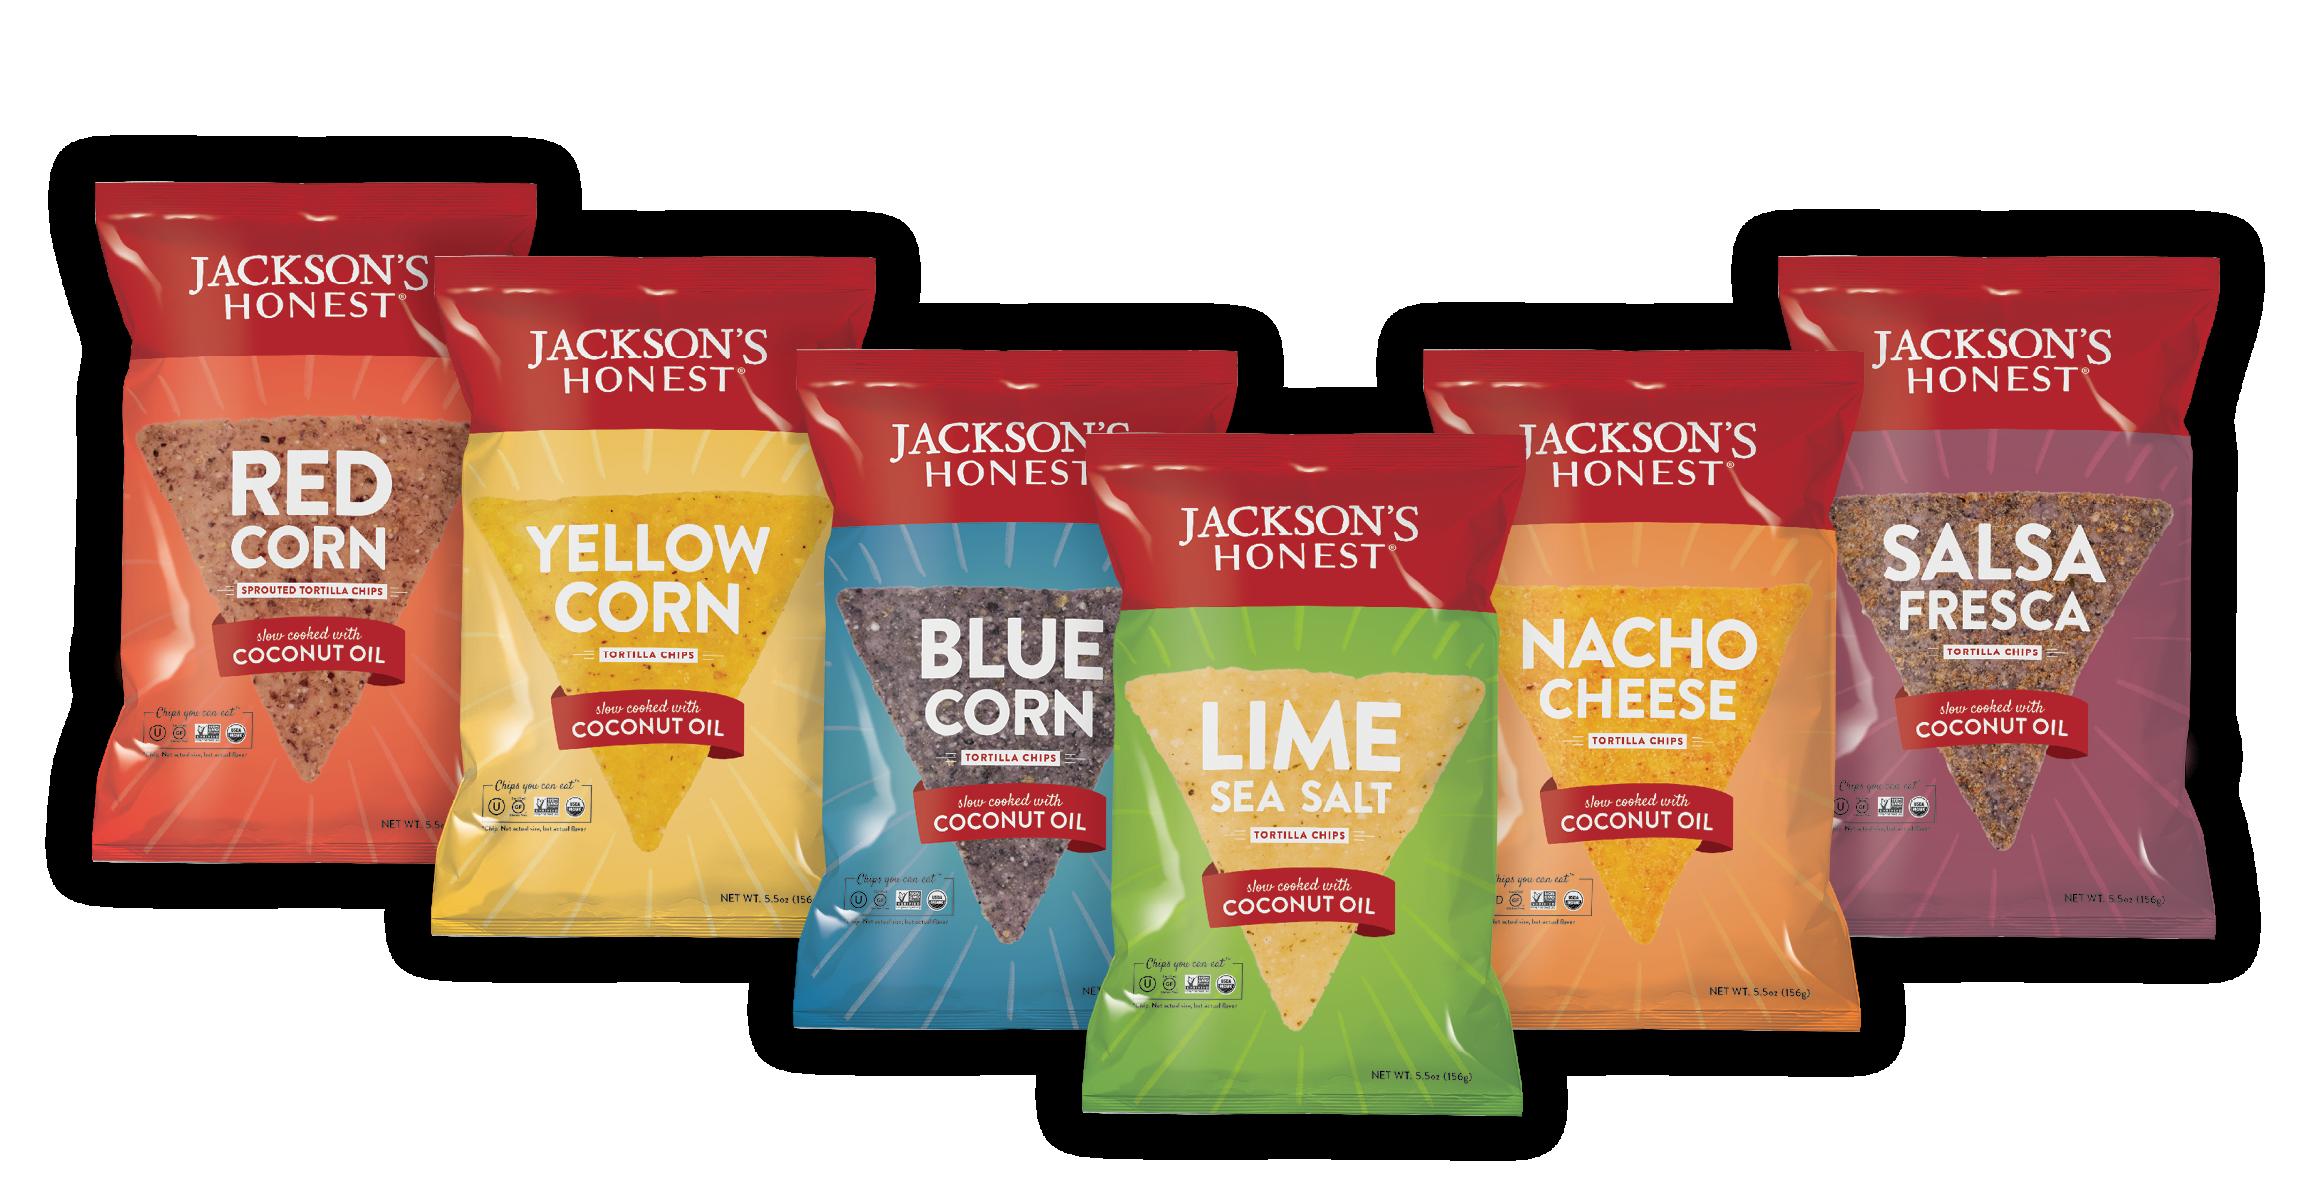 Jackson's Honest Packaging by Megan Hillman